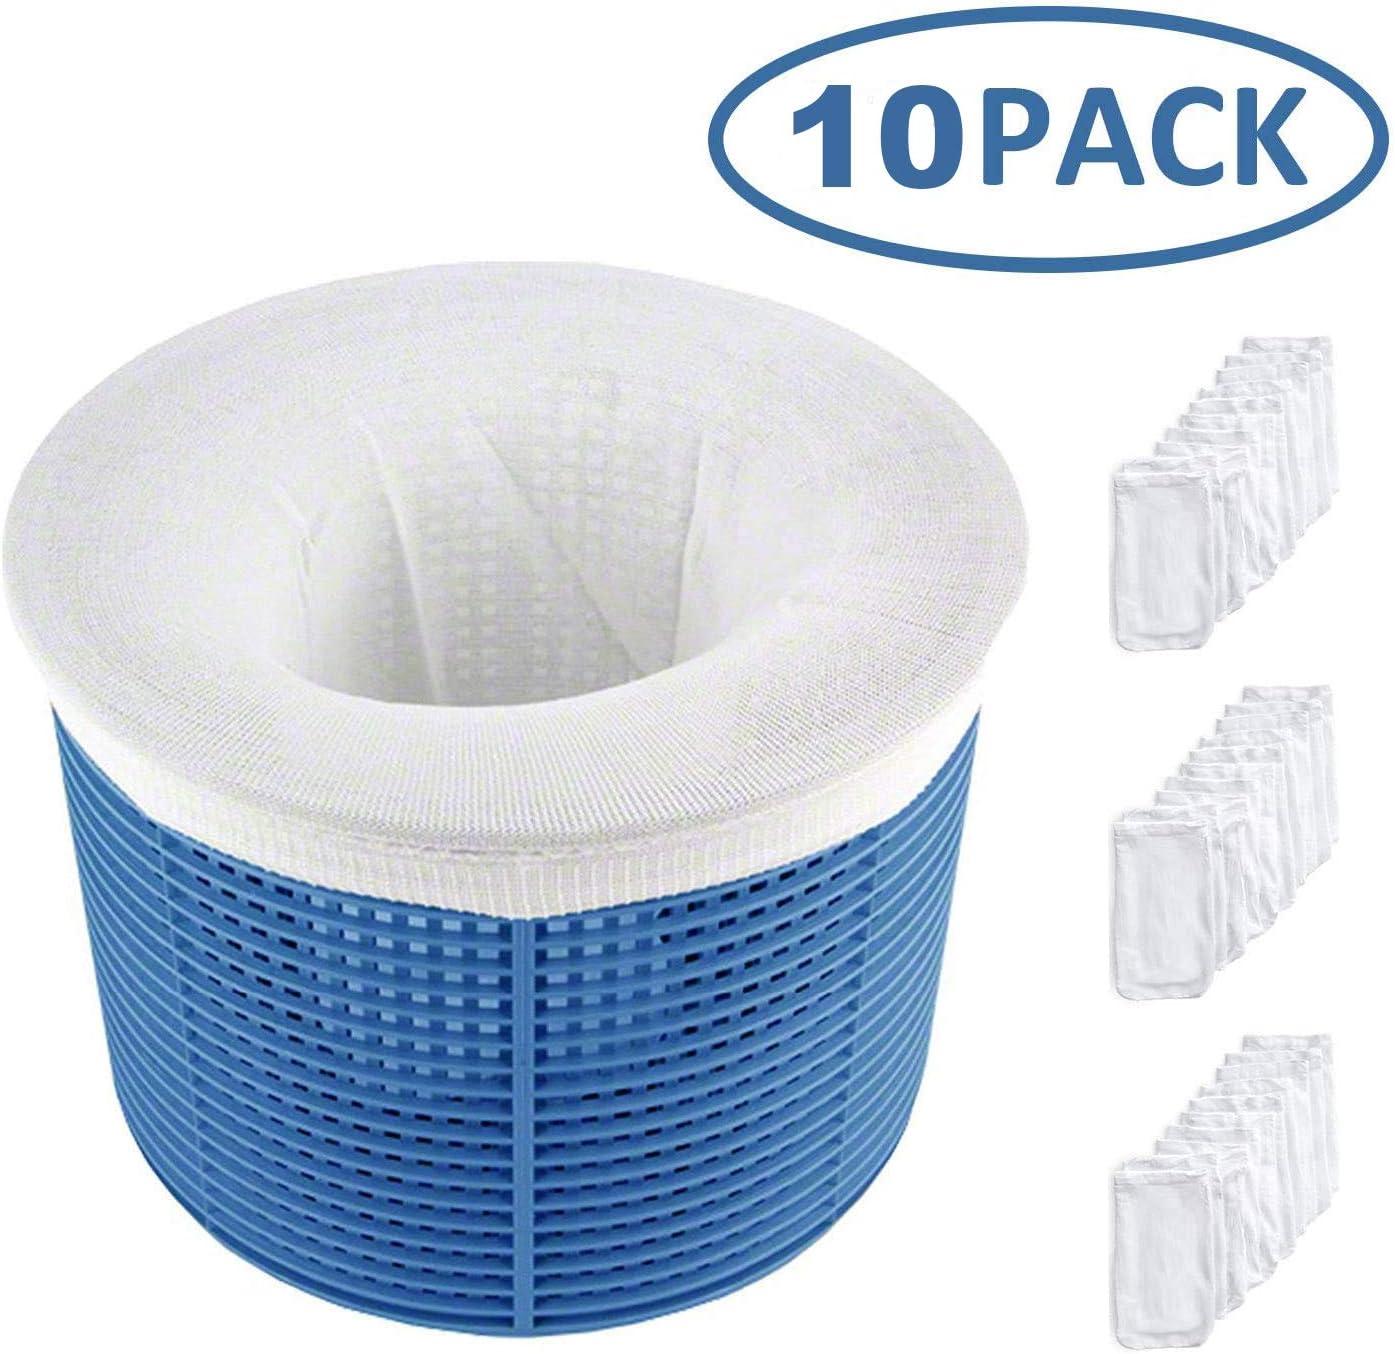 HIQE-FL Skimmer Korb Filter,Schwimmbad Skimmer Socken,Pool Skimmer Socken Filter,Filter Skimmer Pool,Schwimmbad Korb,Filterschoner zum Schutz Ihrer Filter,Wei/ß 10 pcs